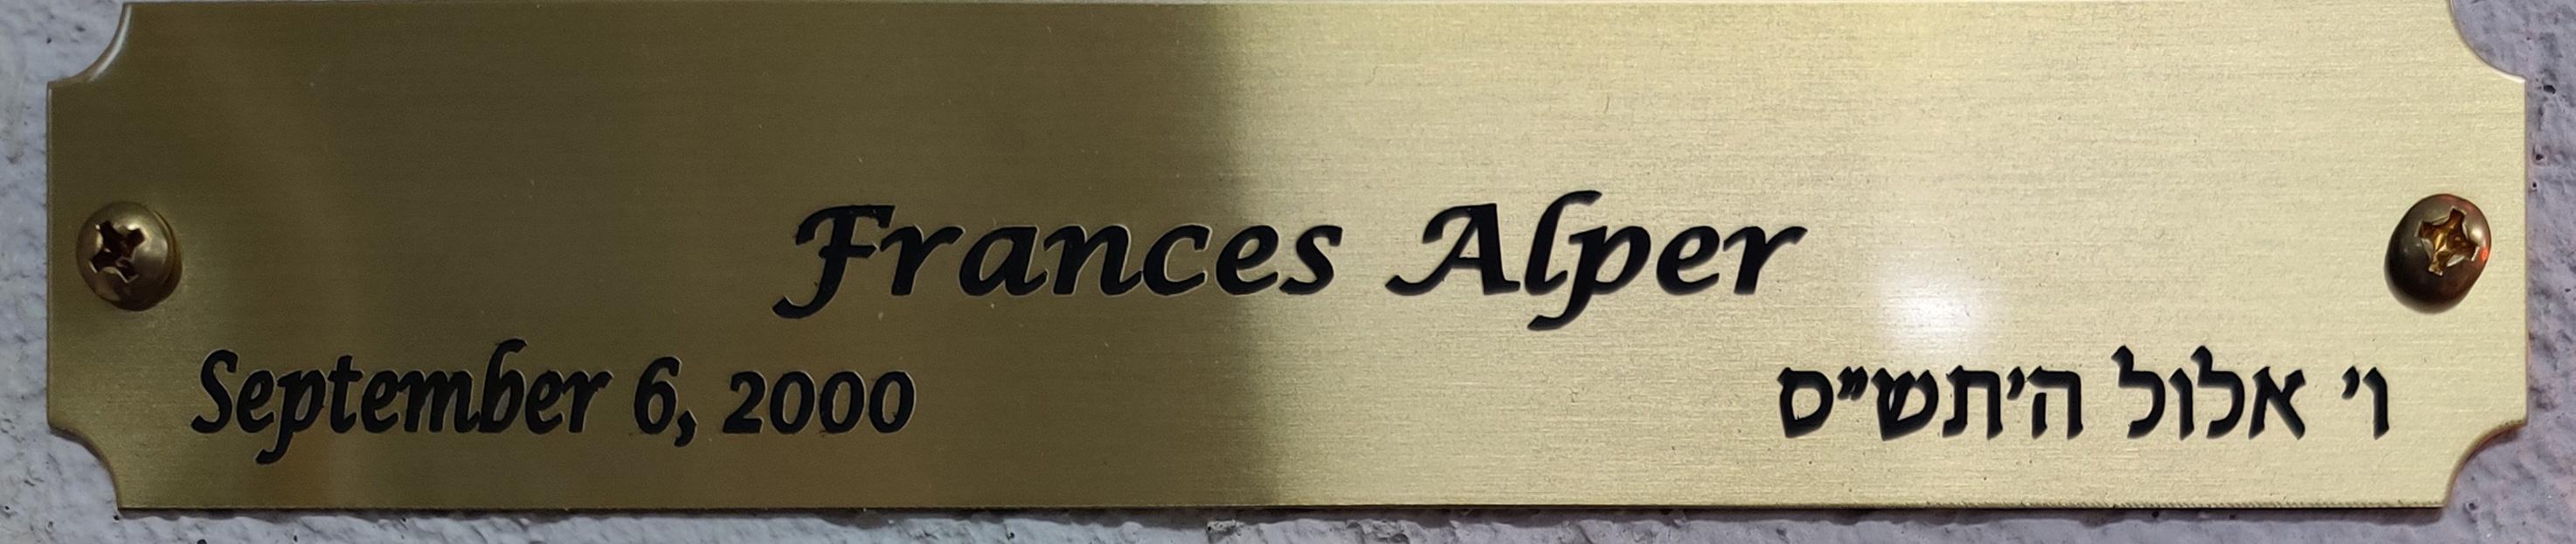 9-Frances_Alper.jpg